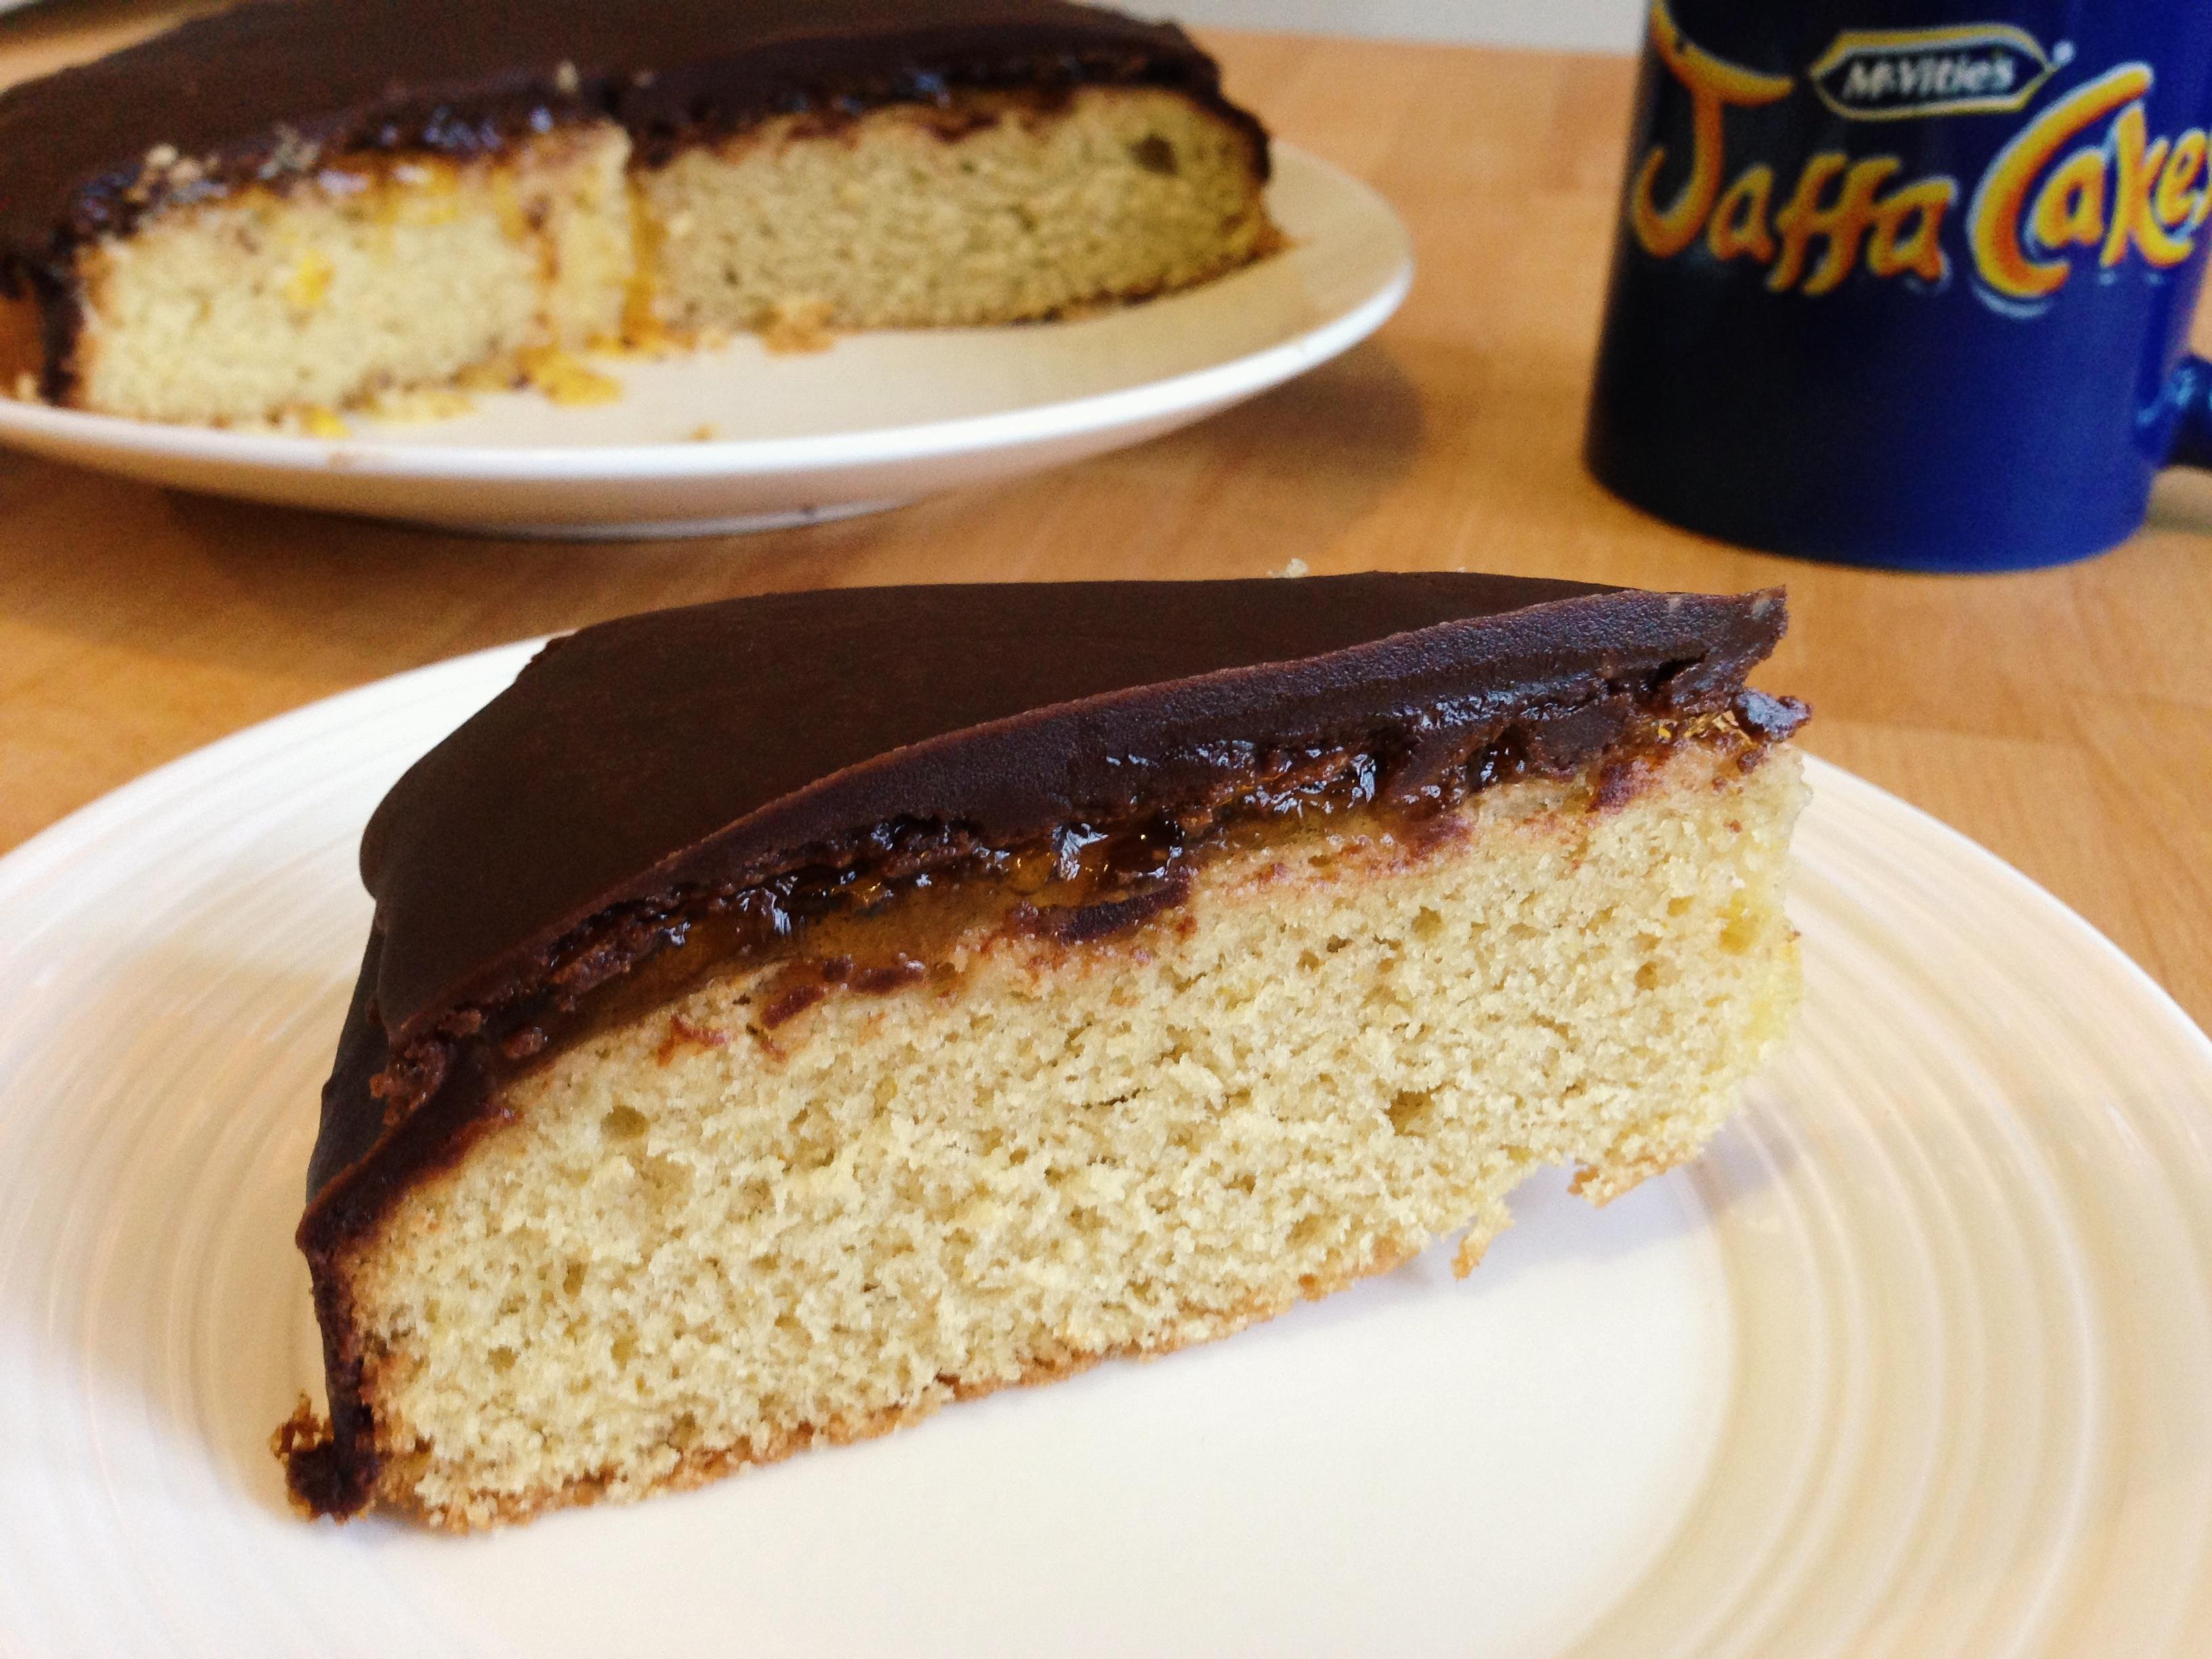 Where Can I Buy Jaffa Cakes